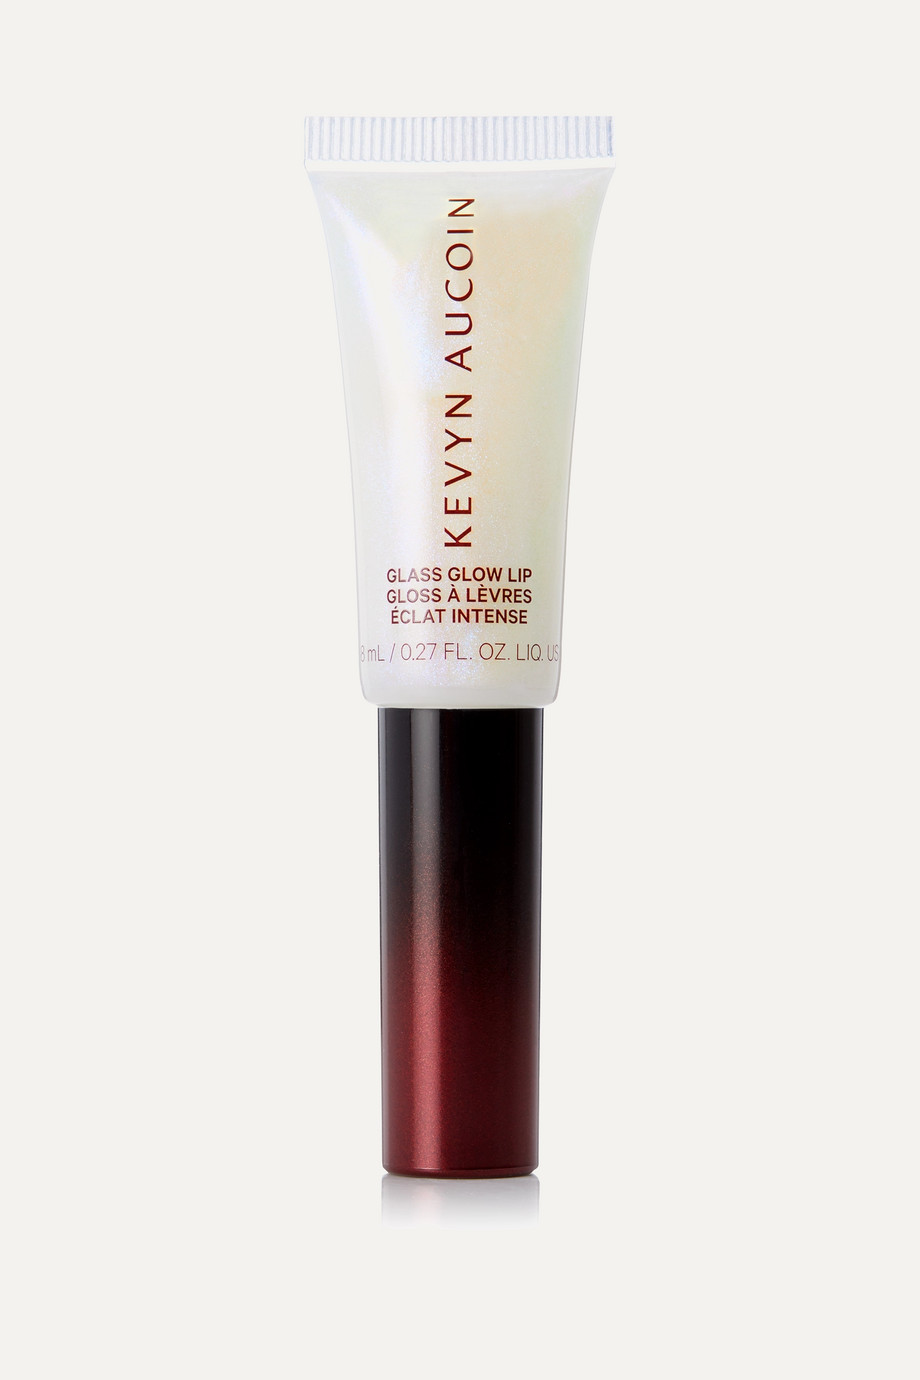 Kevyn Aucoin Glass Glow Lip Gloss - Crystal Clear, 8ml